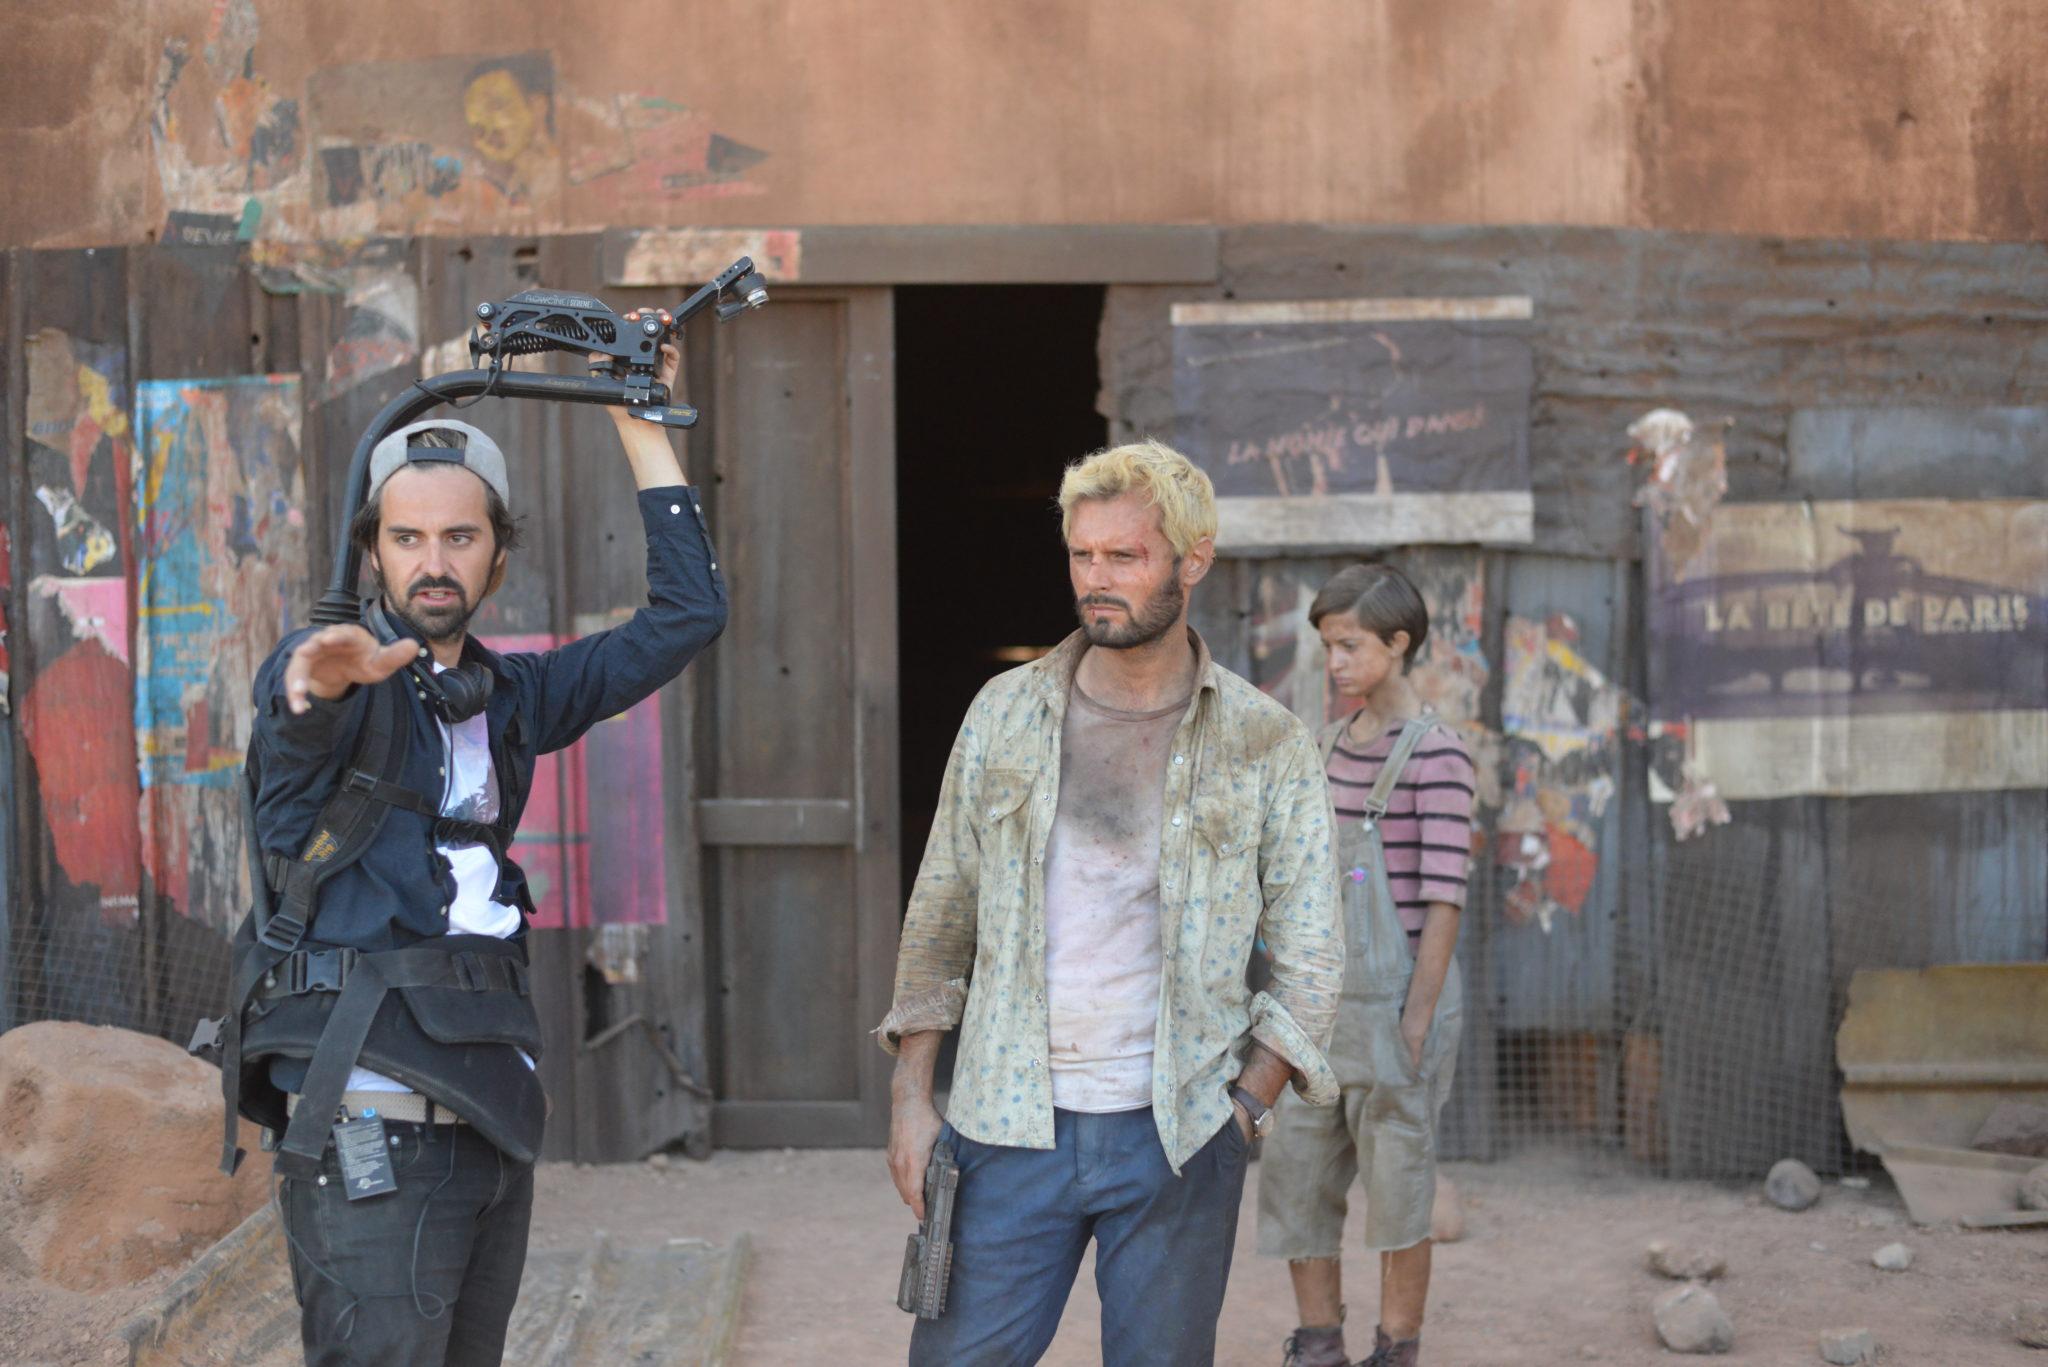 Romain Quirot Hugo Becker Le Dernier Voyage de Paul W.R photo tournage